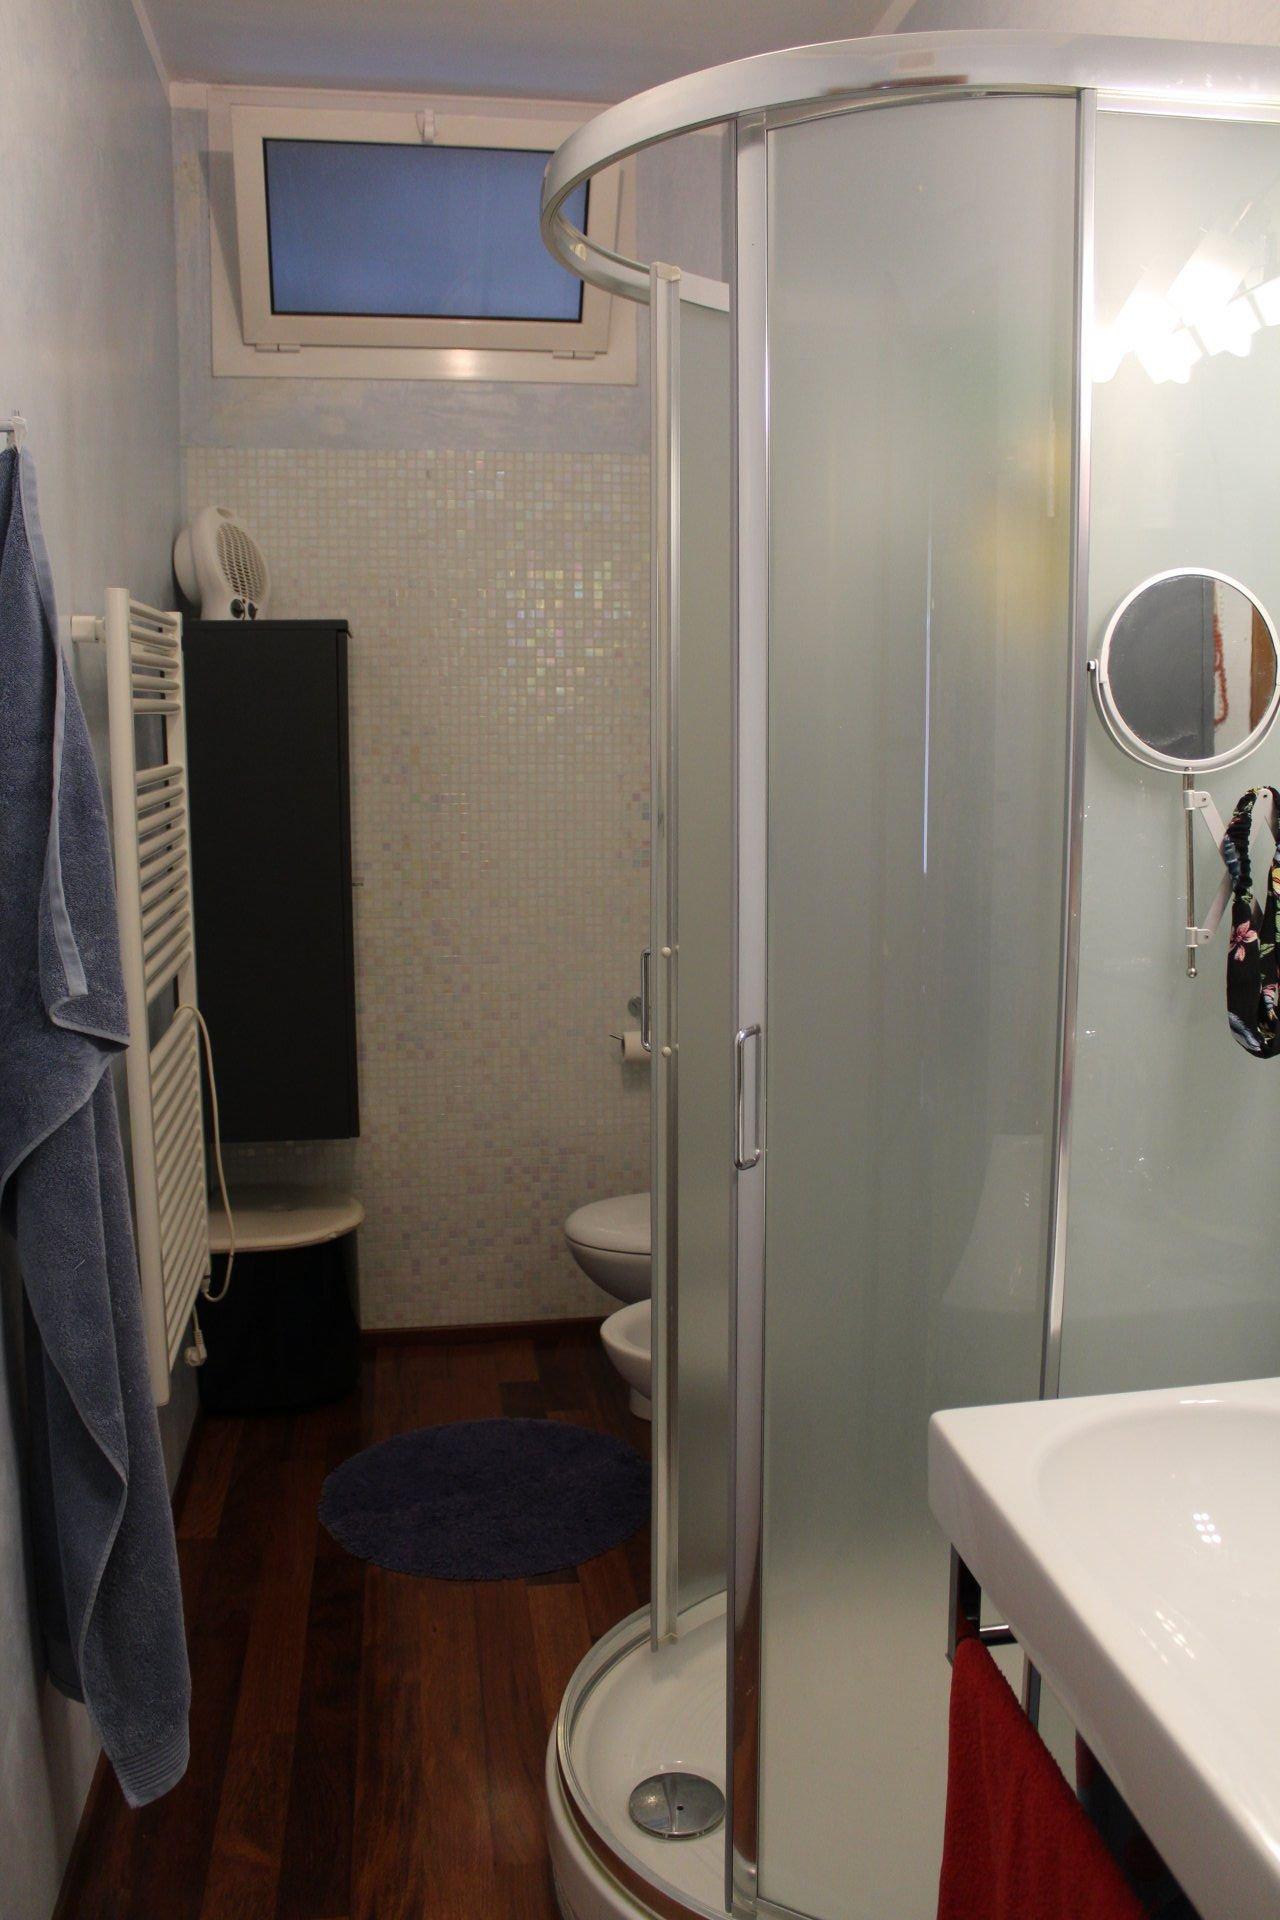 Sale Apartment - Ventimiglia Balzi Rossi - Italy